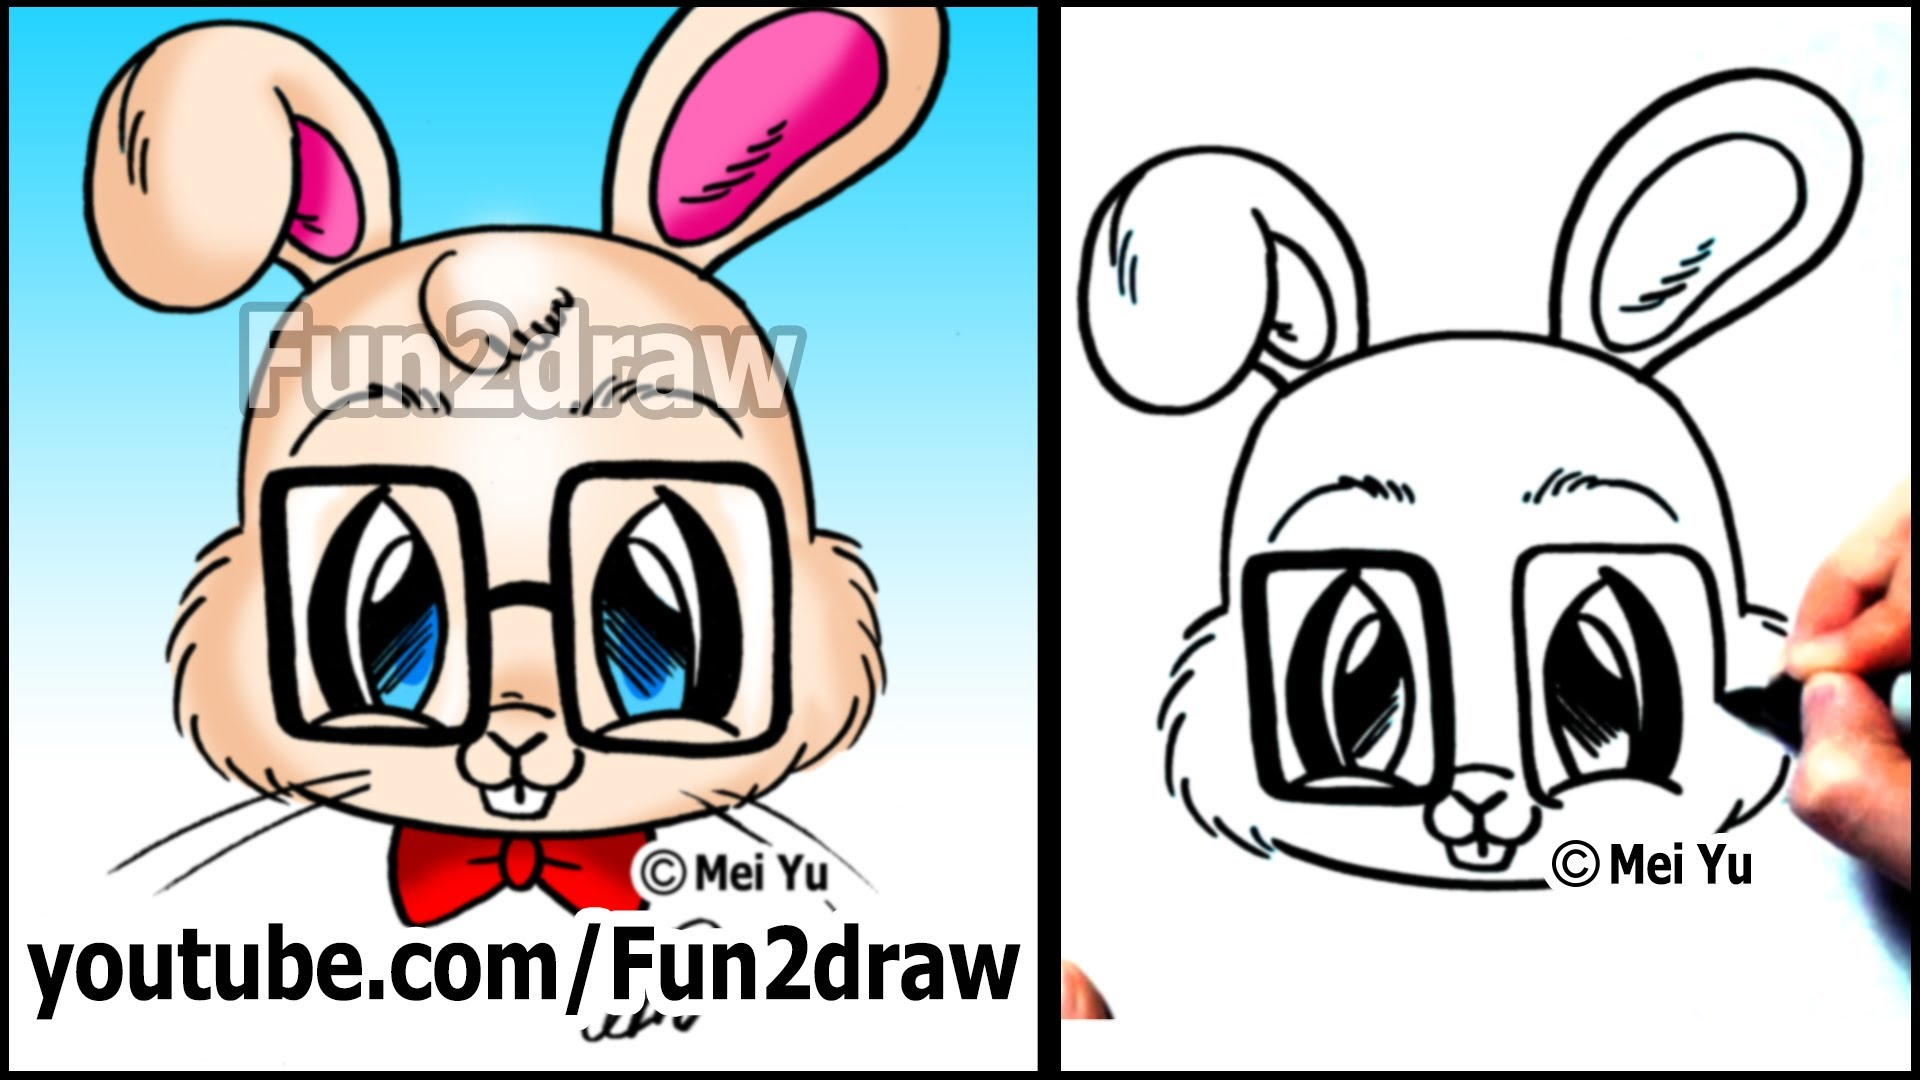 Drawn rabbit funny bunny Animals Easy Easy Rabbit How